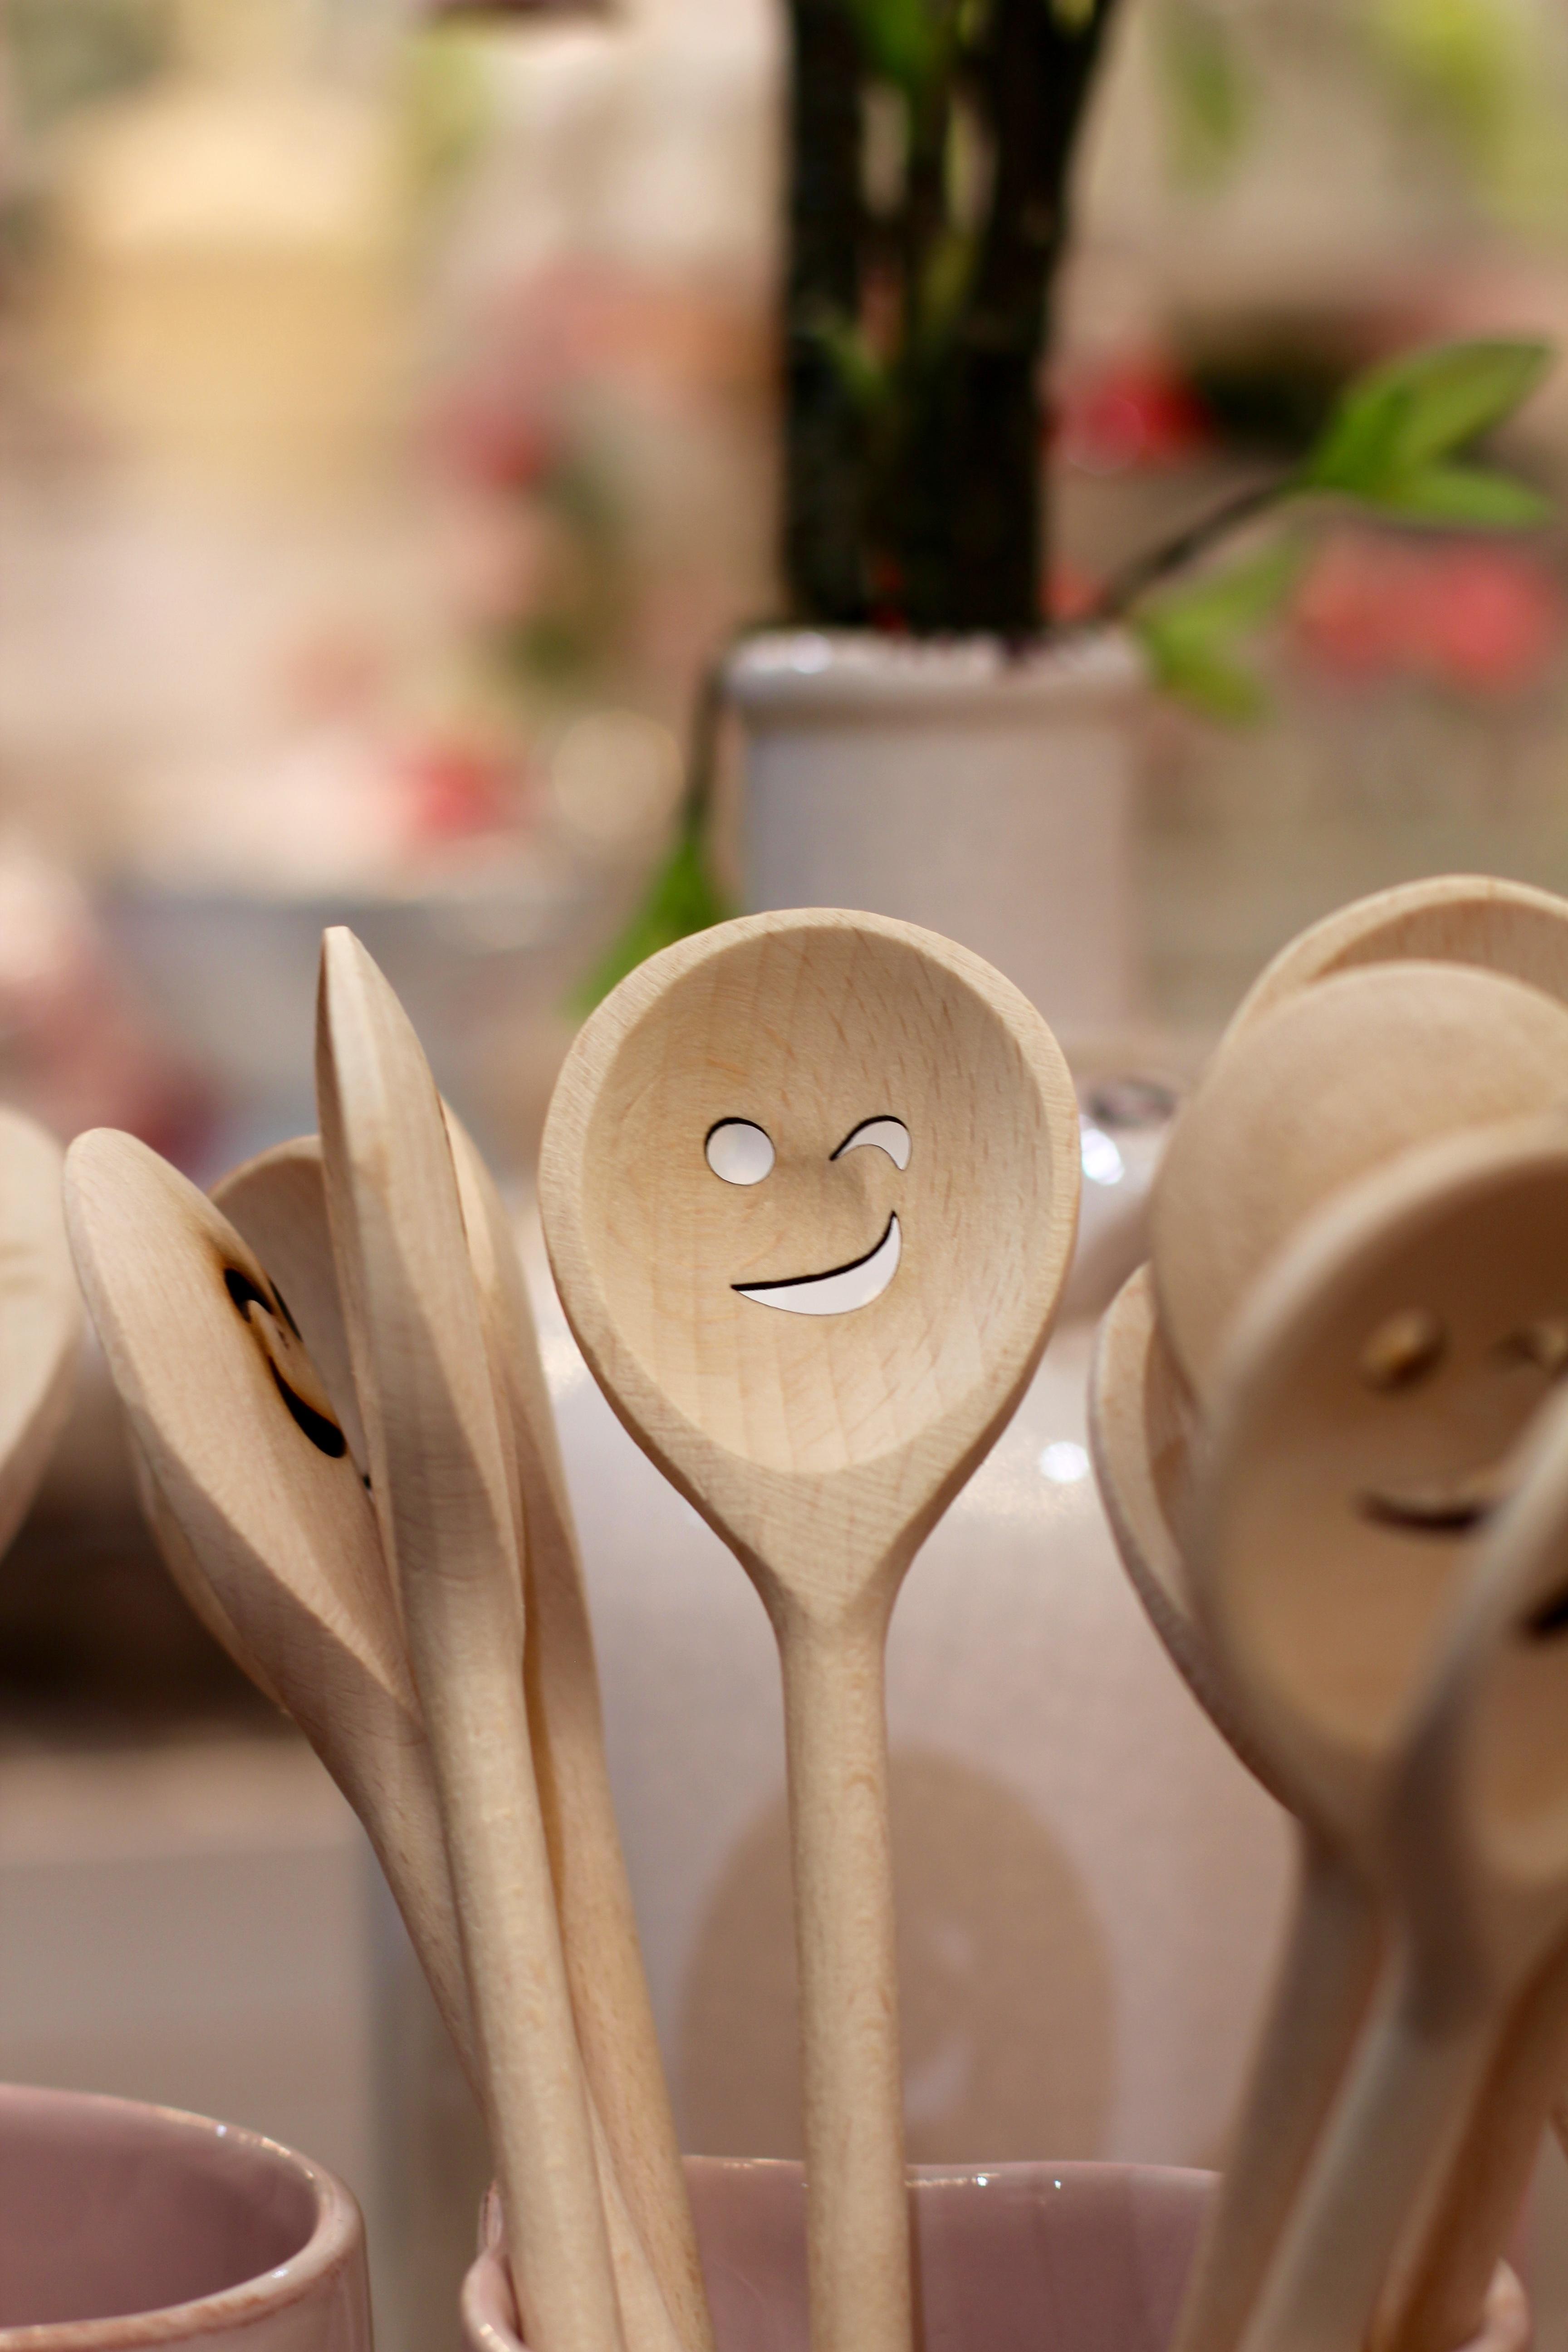 Gambar Bunga Makanan Dekat Tertawa Riang Menghadapi Sendok Kayu Garpu Wooden Cutlery Spoon Fork